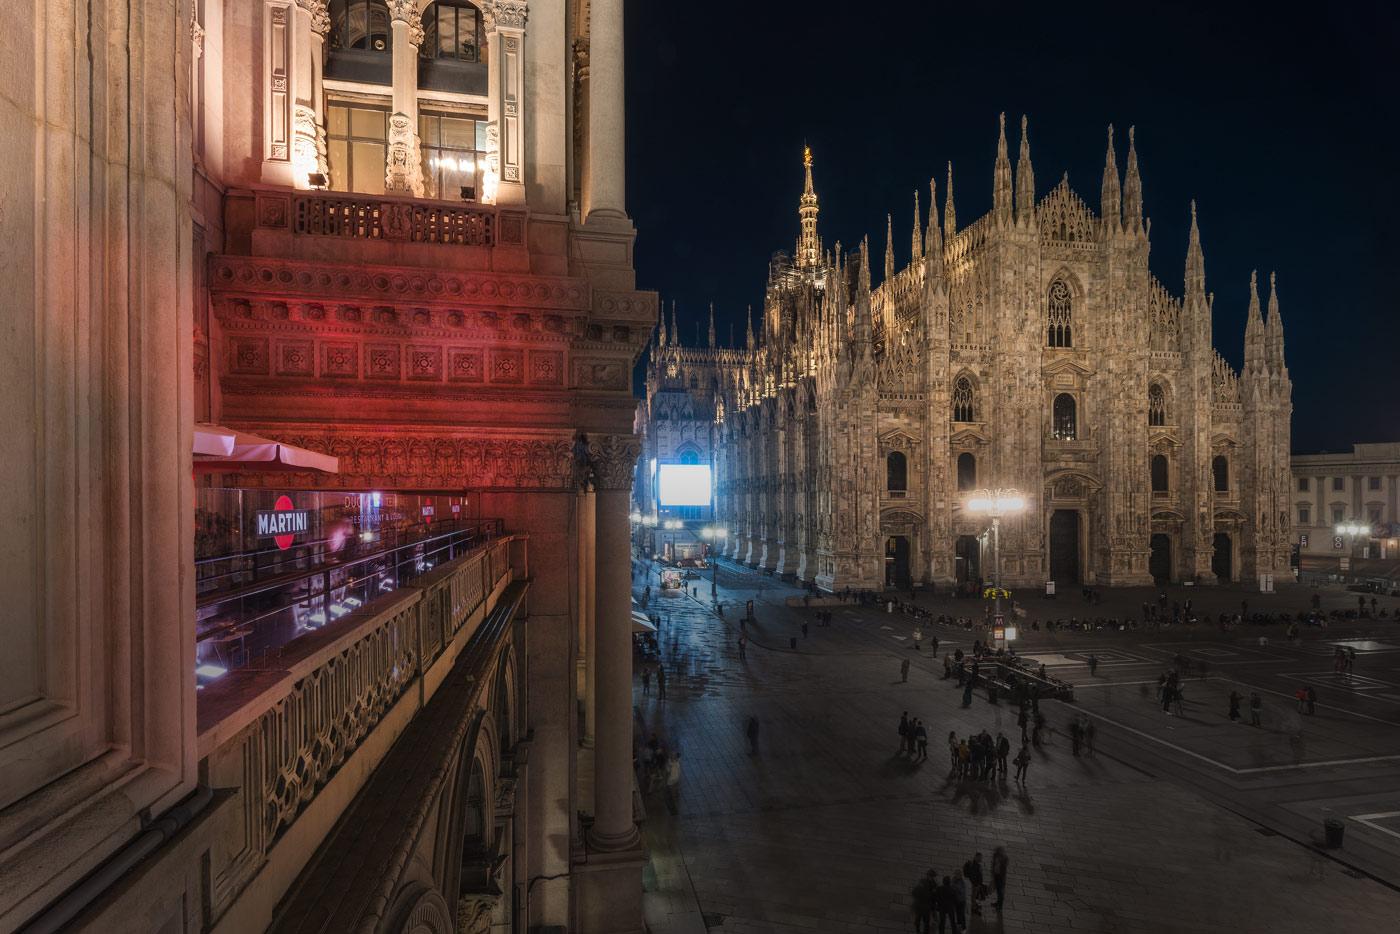 Profumo Rooftop Party Terrazza Duomo 21 Cool In Milan